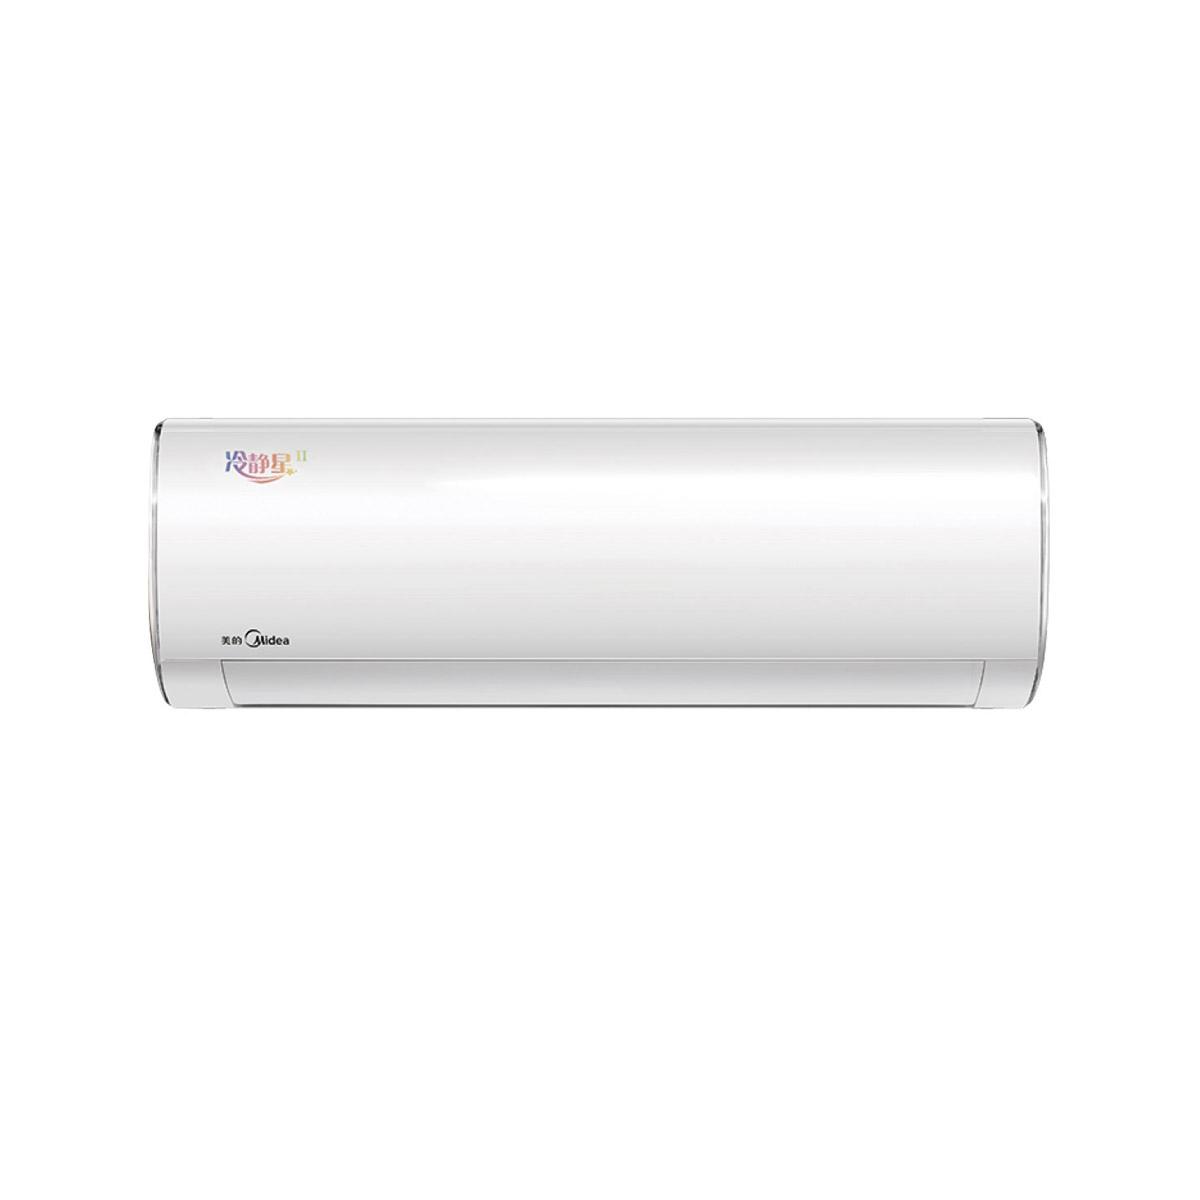 Midea/美的 KFR-35GW/BP3DN8Y-PC401(1)家用空调套机 说明书.pdf